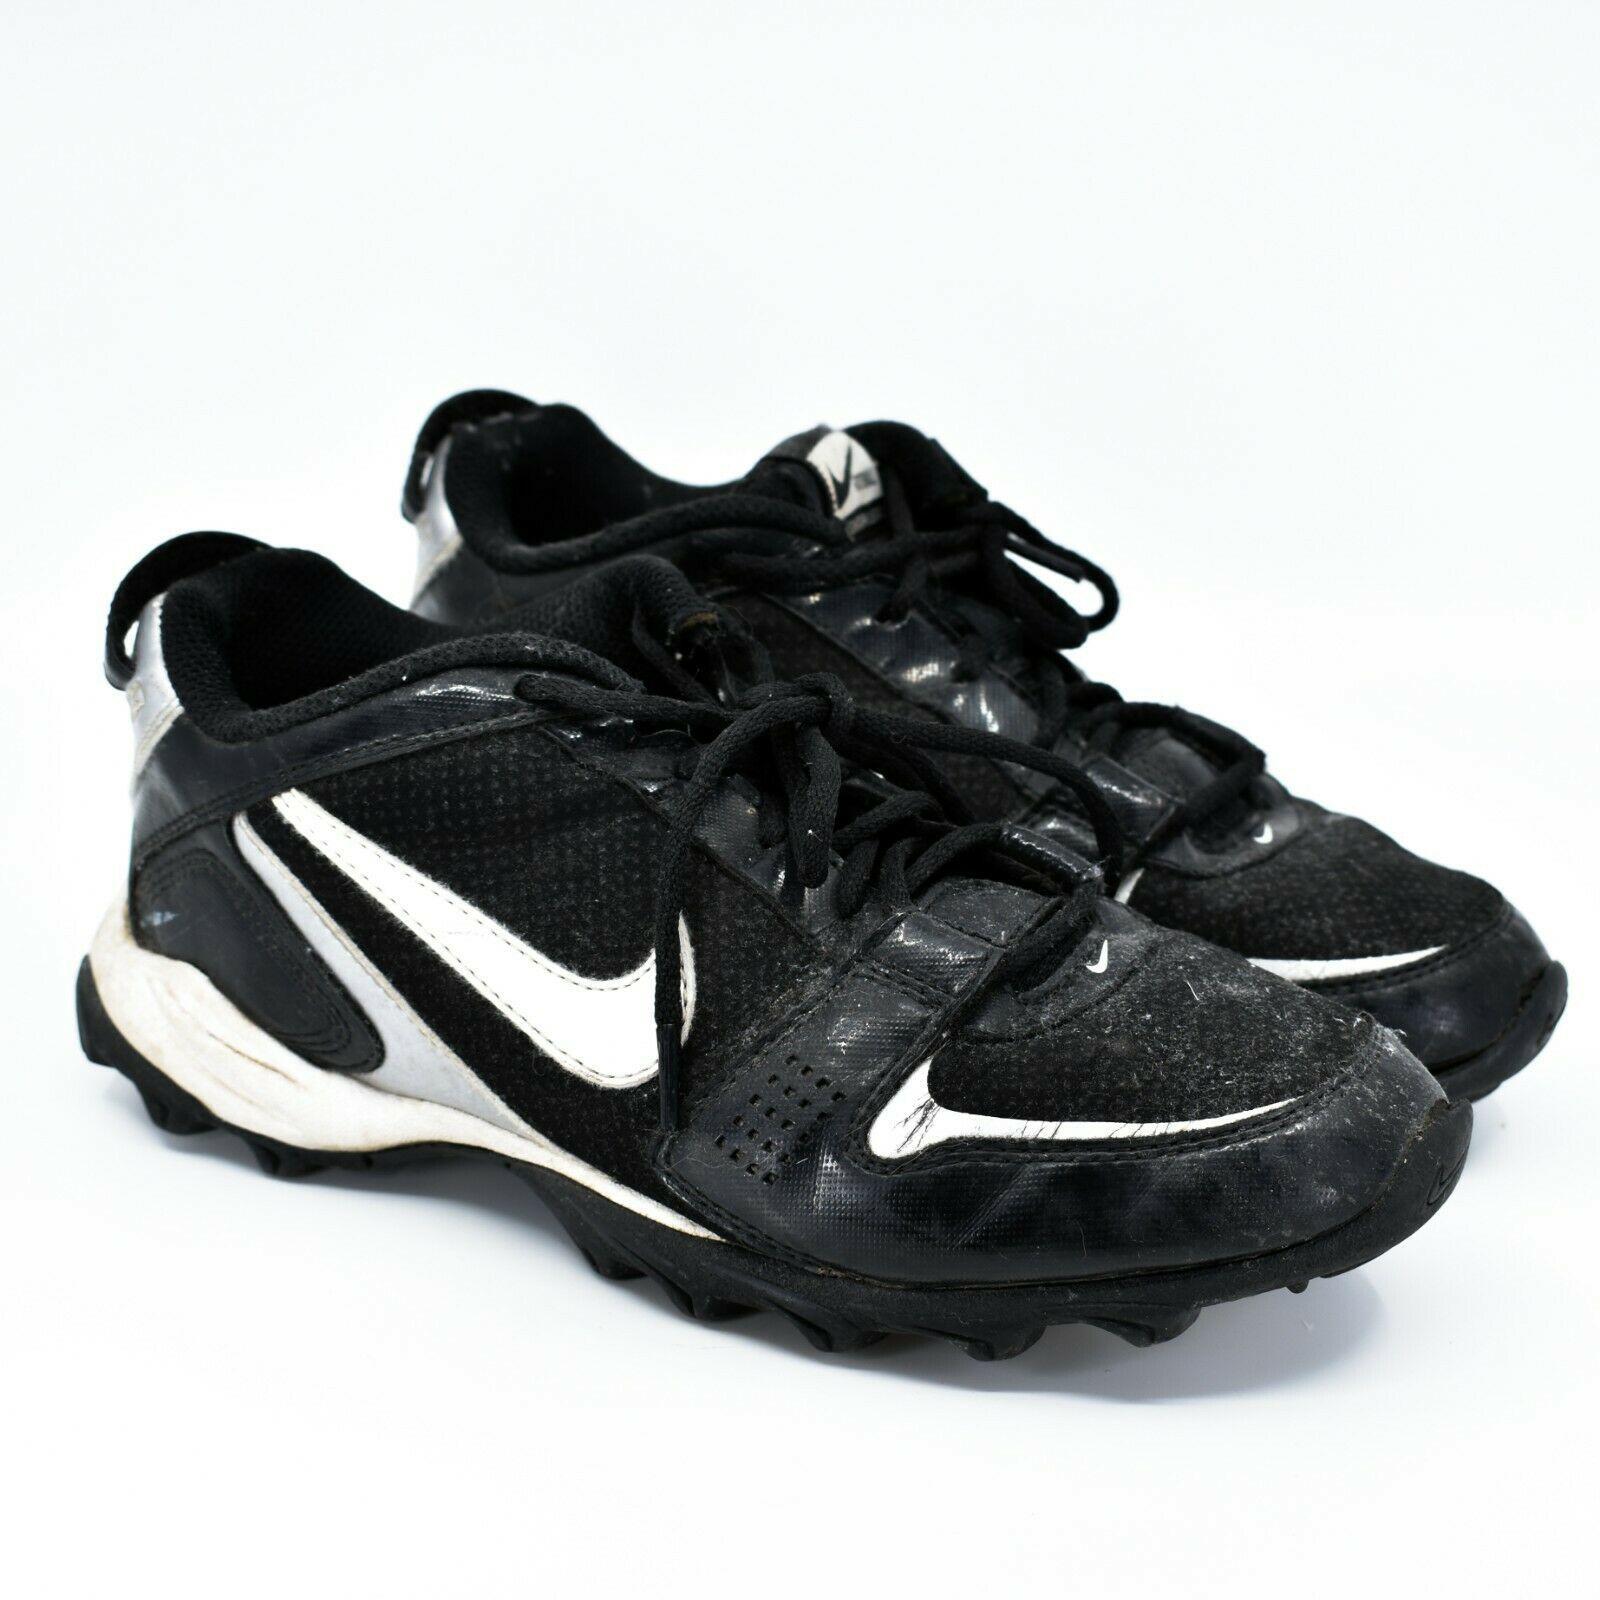 Nike Land Shark Legacy Boy's Youth Kids Black & White Football Cleats Size 6Y